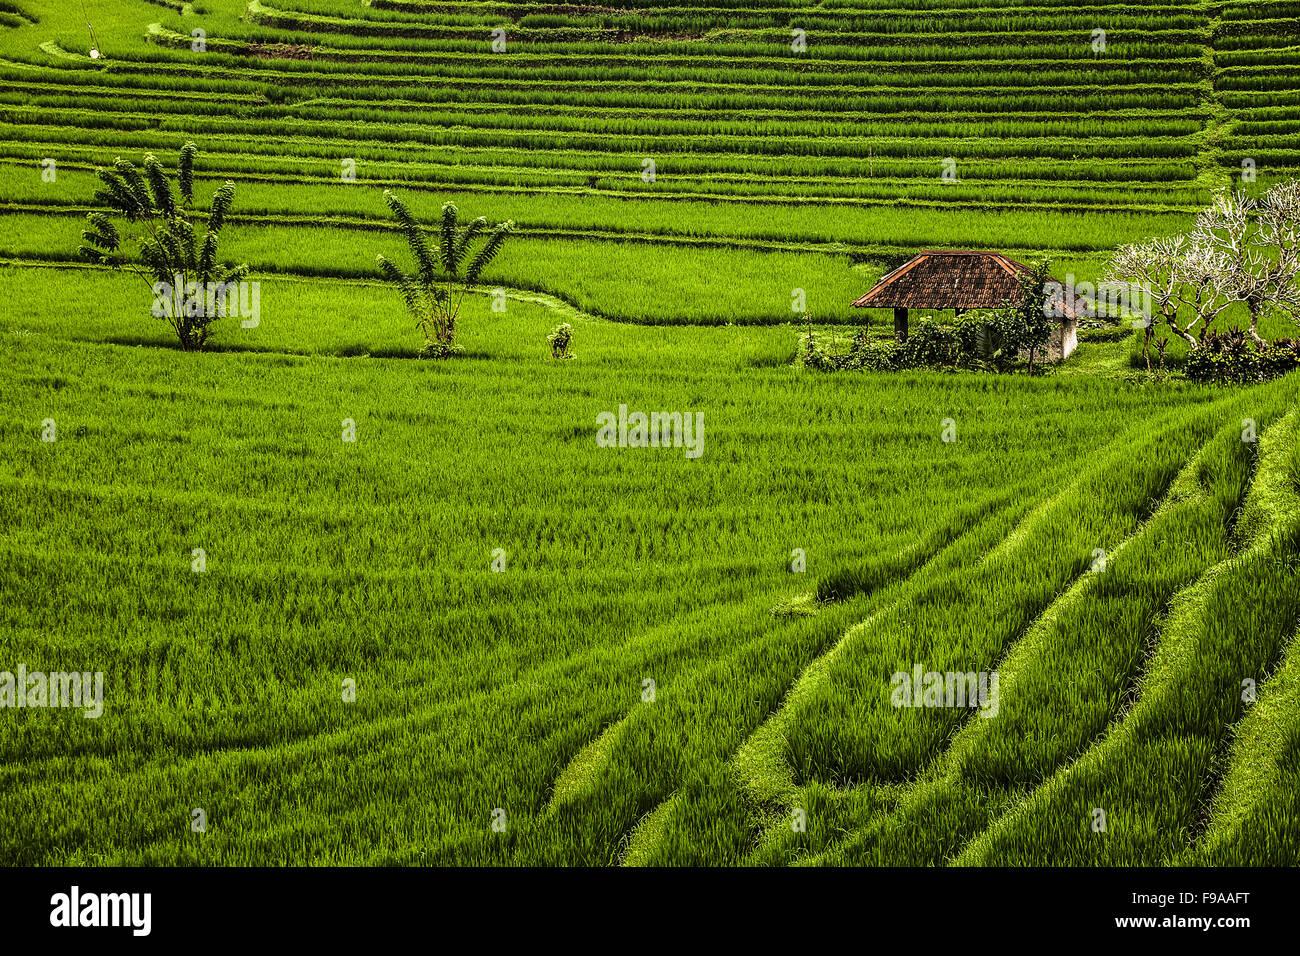 Rice terraces in Bali - Stock Image